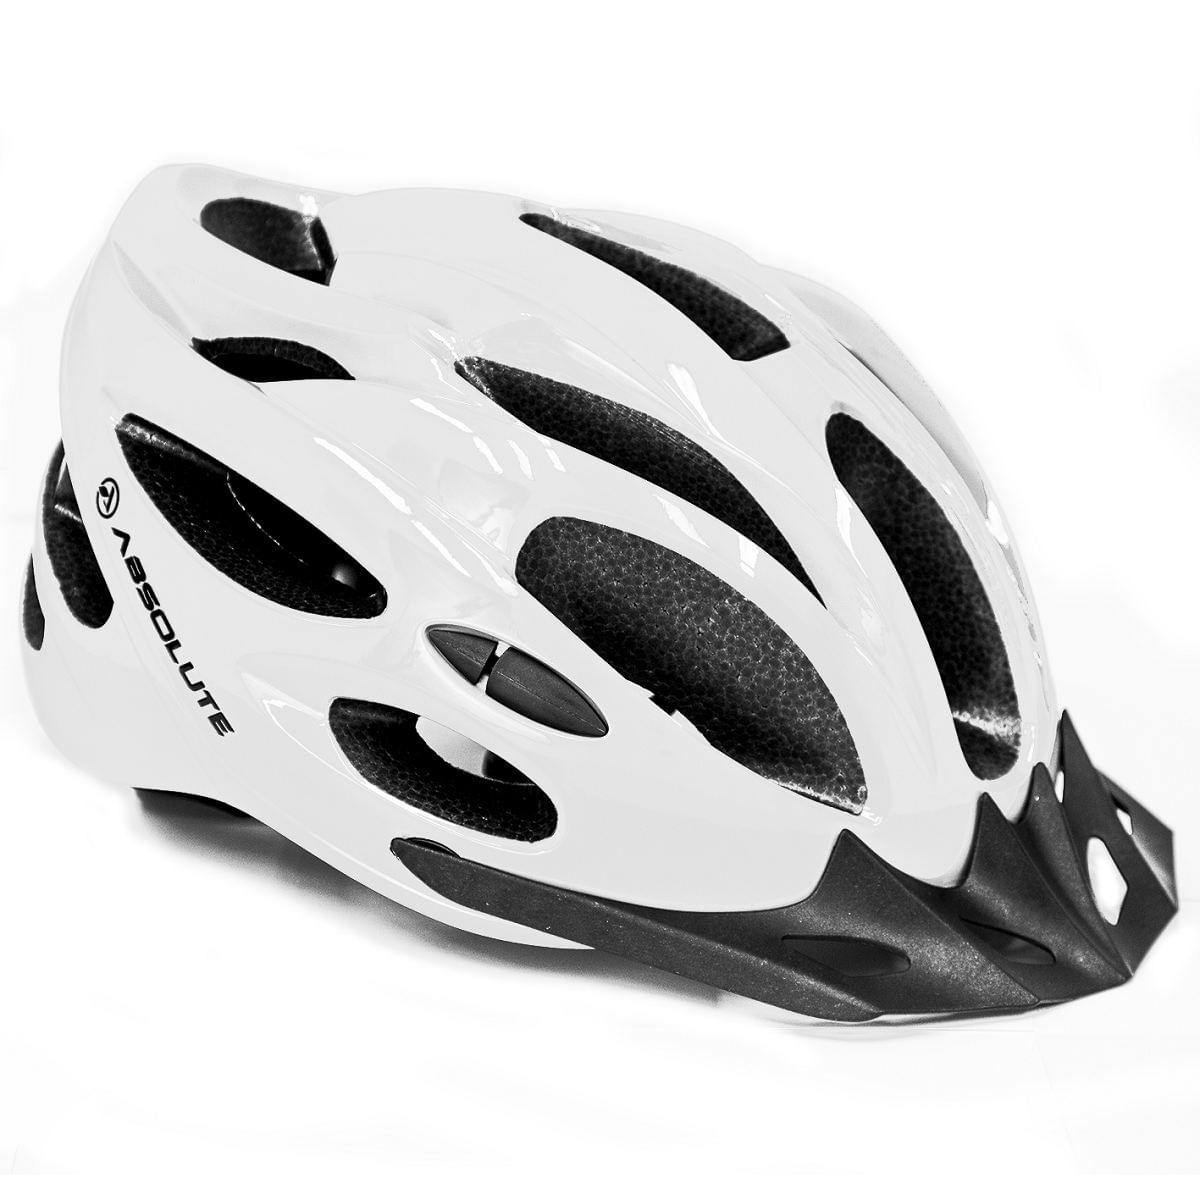 Capacete-de-Bike-Absolute-Nero-Inmold-Branco-com-Viseira-e-Led---9768--3-